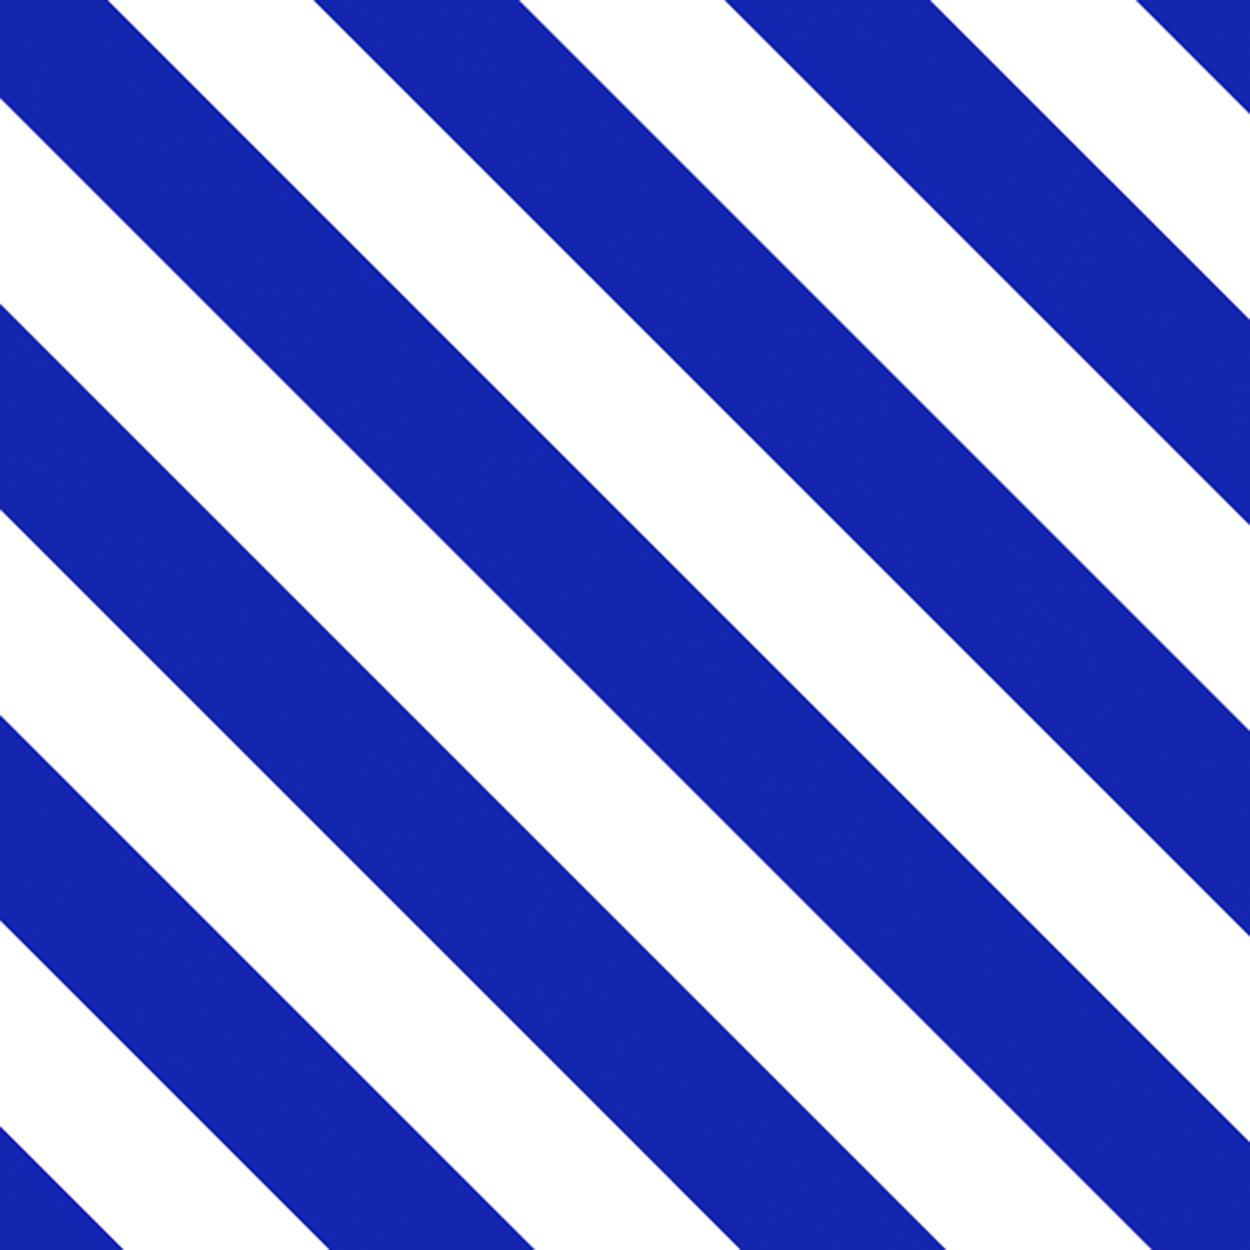 azulejo_2